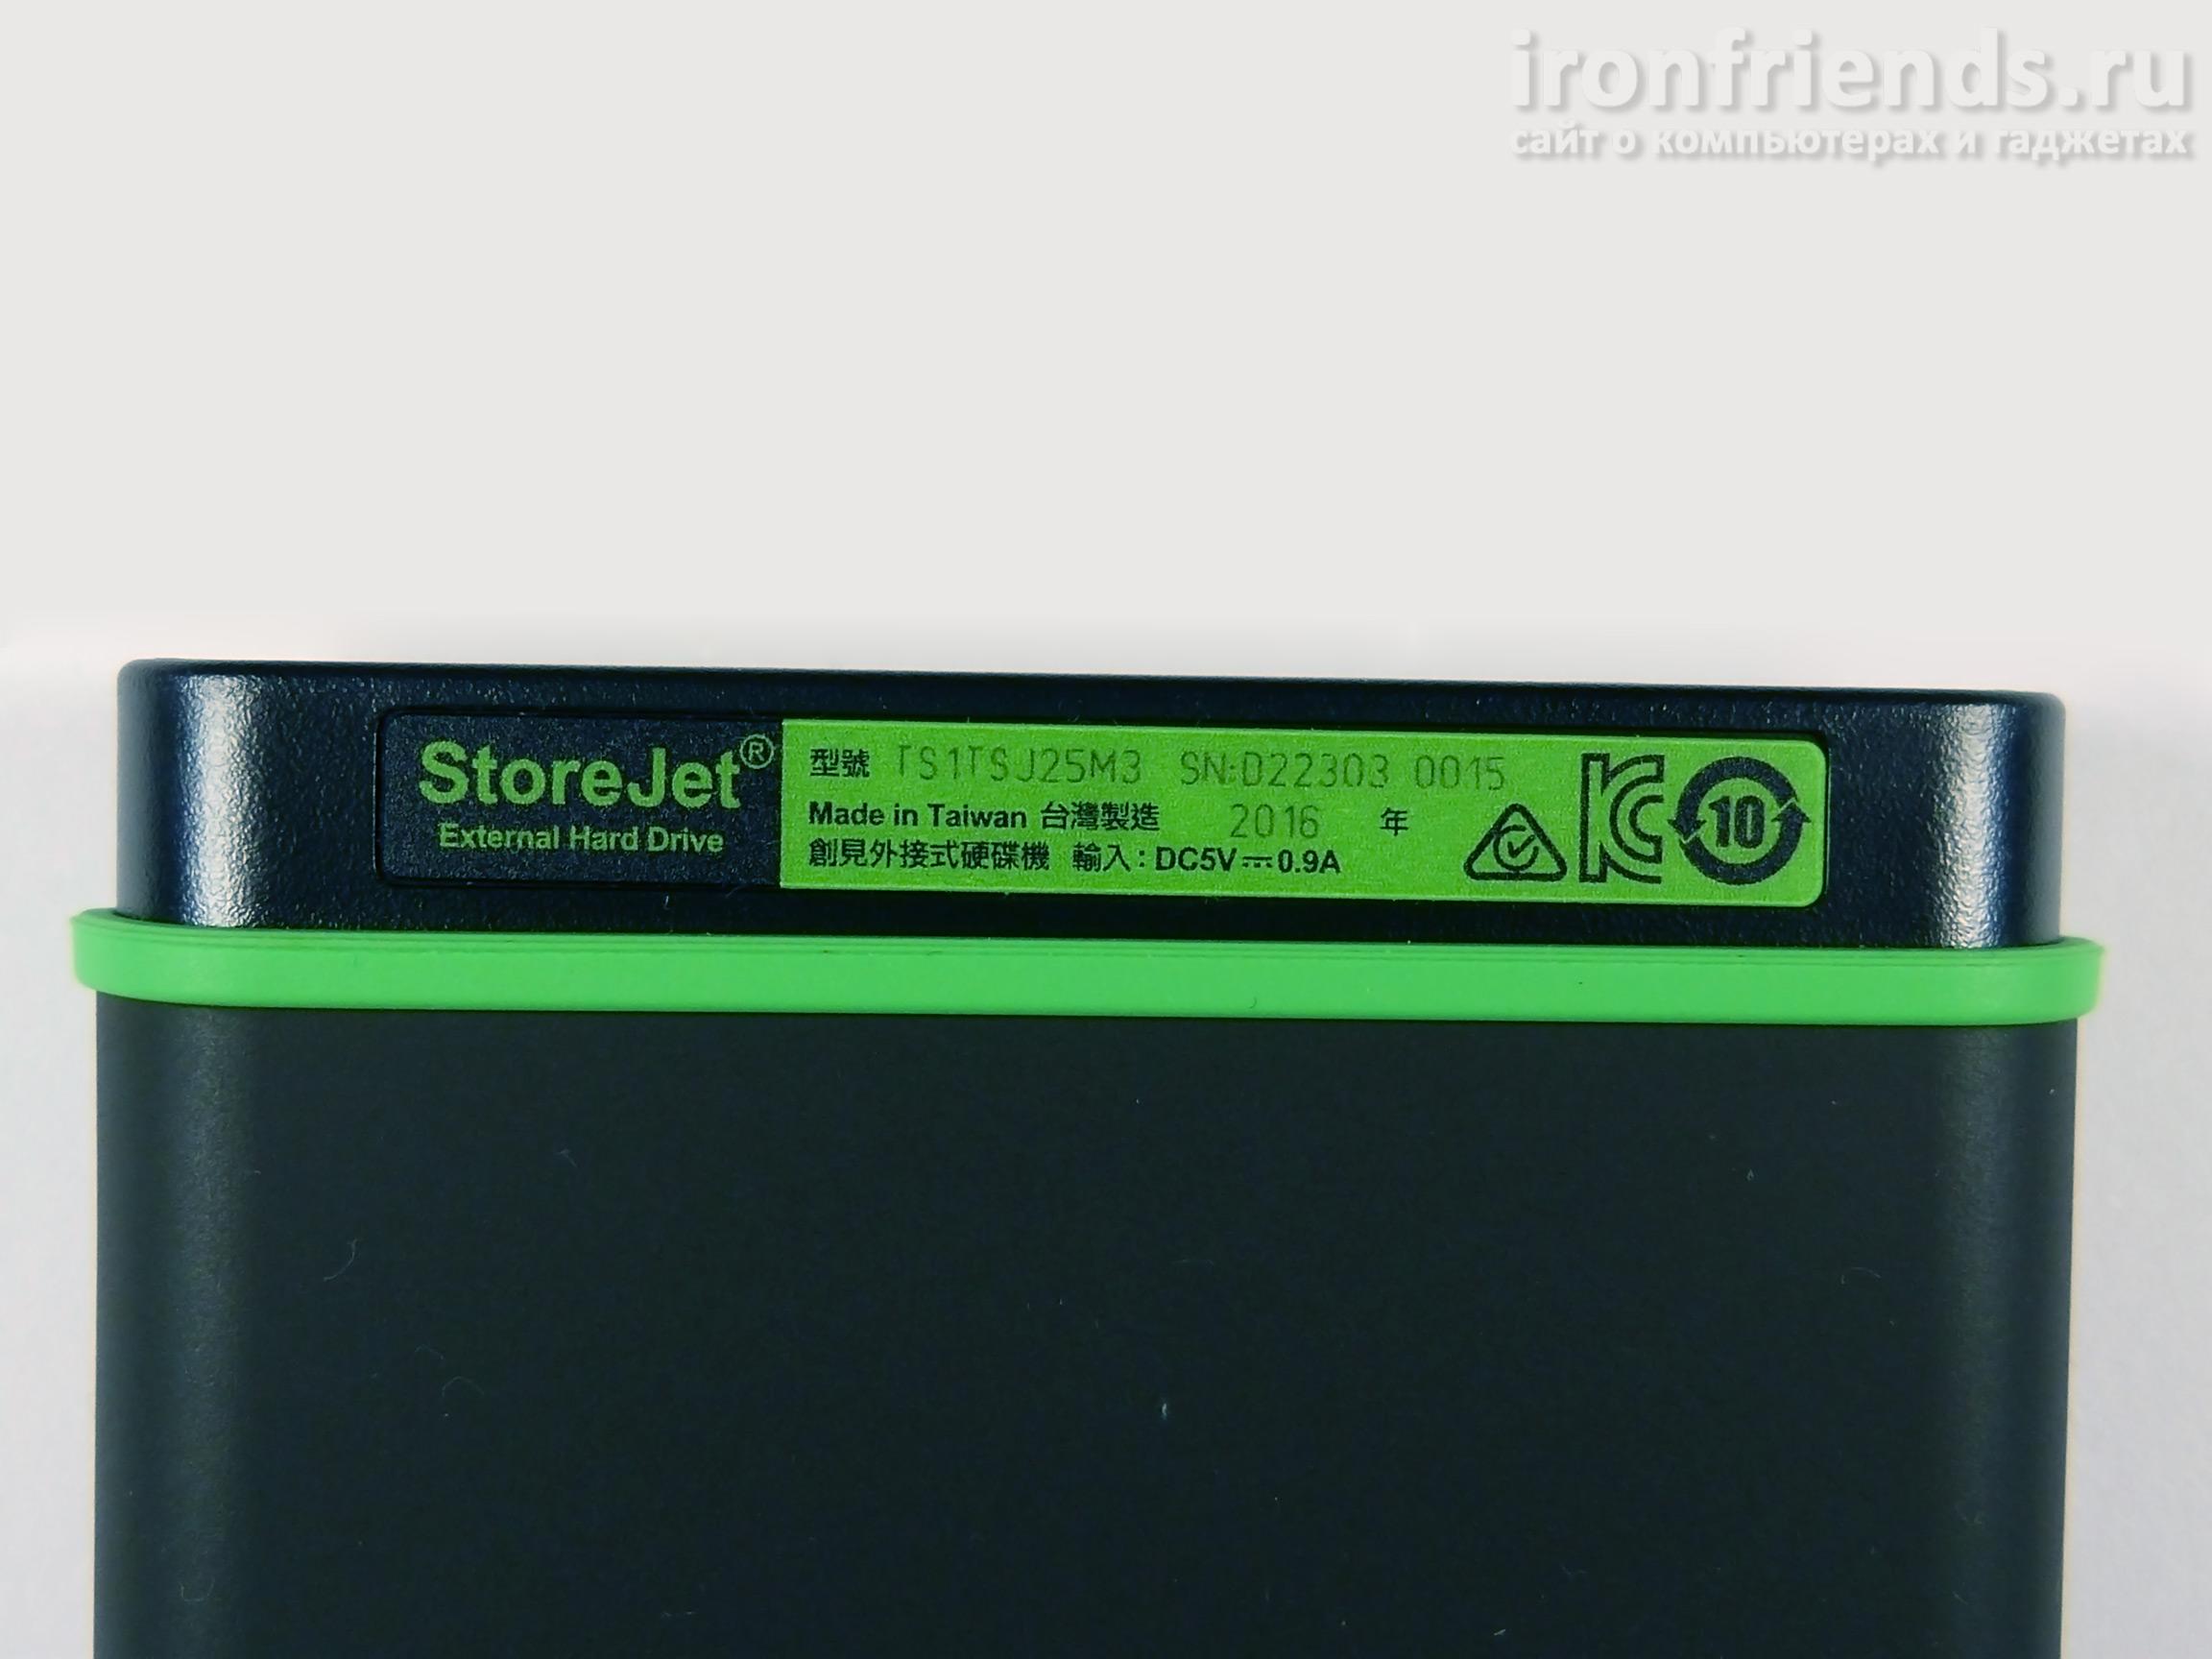 Внешний диск Transcend StoreJet 25M3